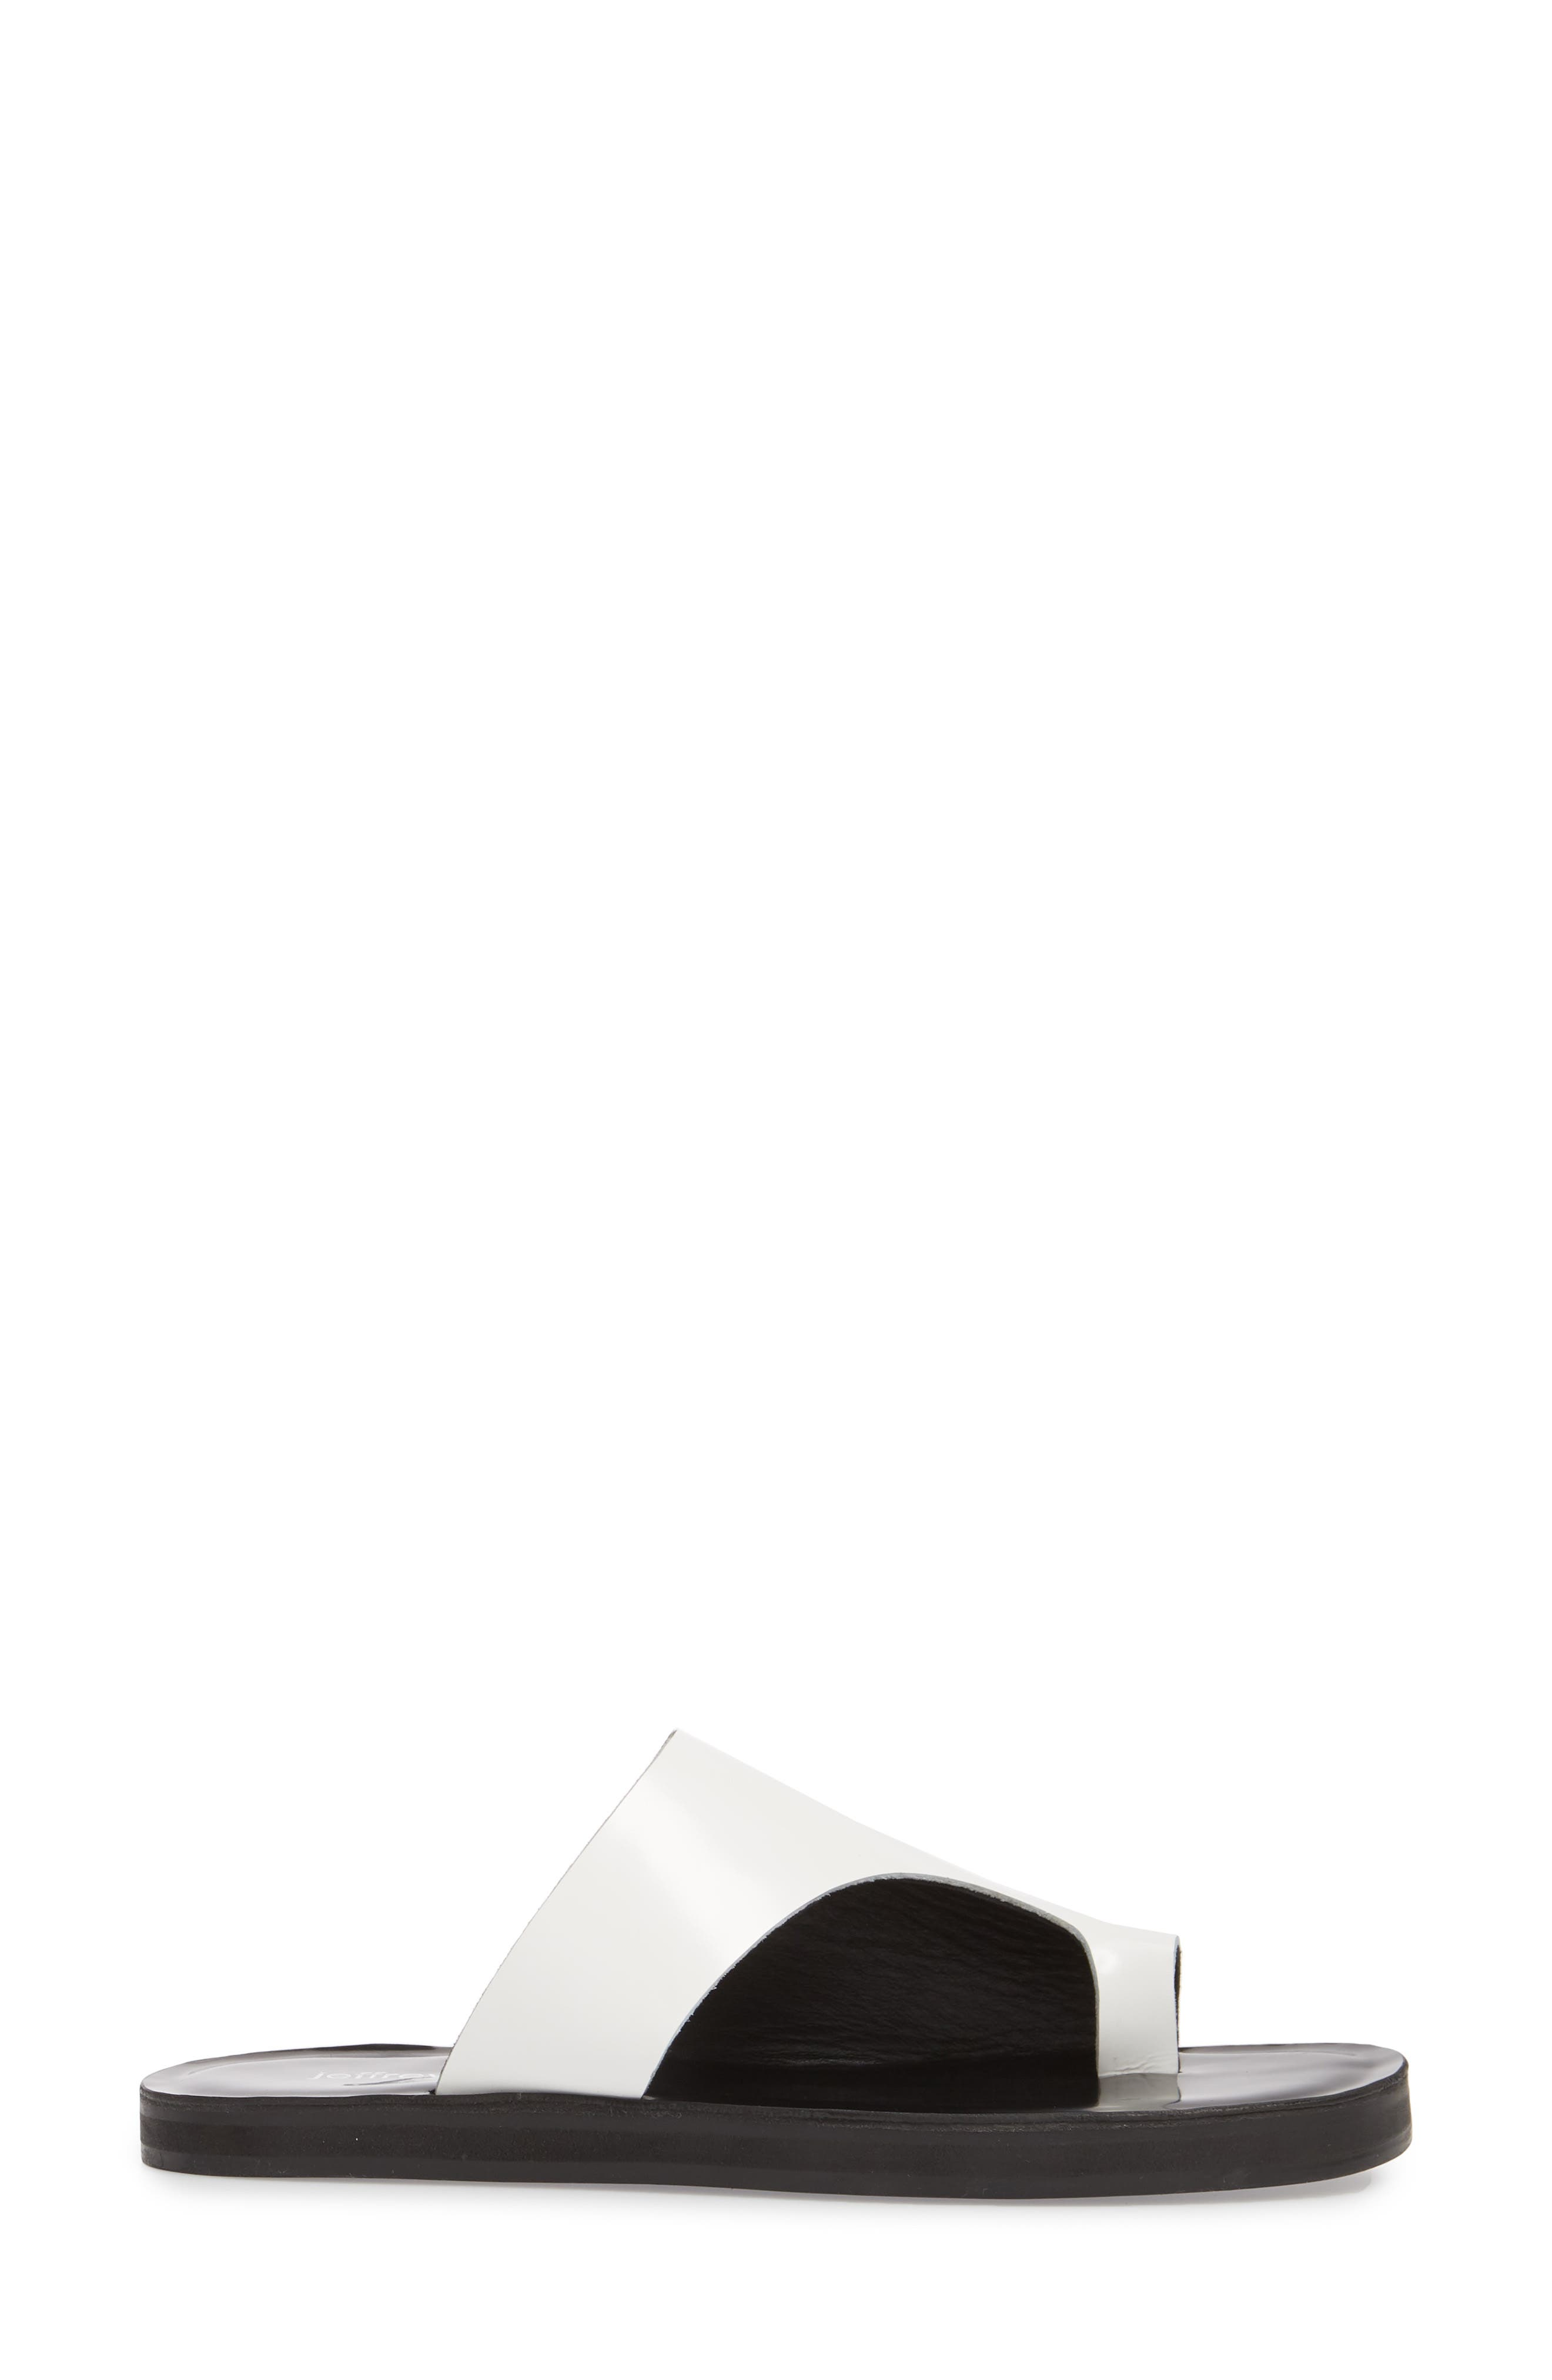 Morada Asymmetrical Slide Sandal,                             Alternate thumbnail 3, color,                             107